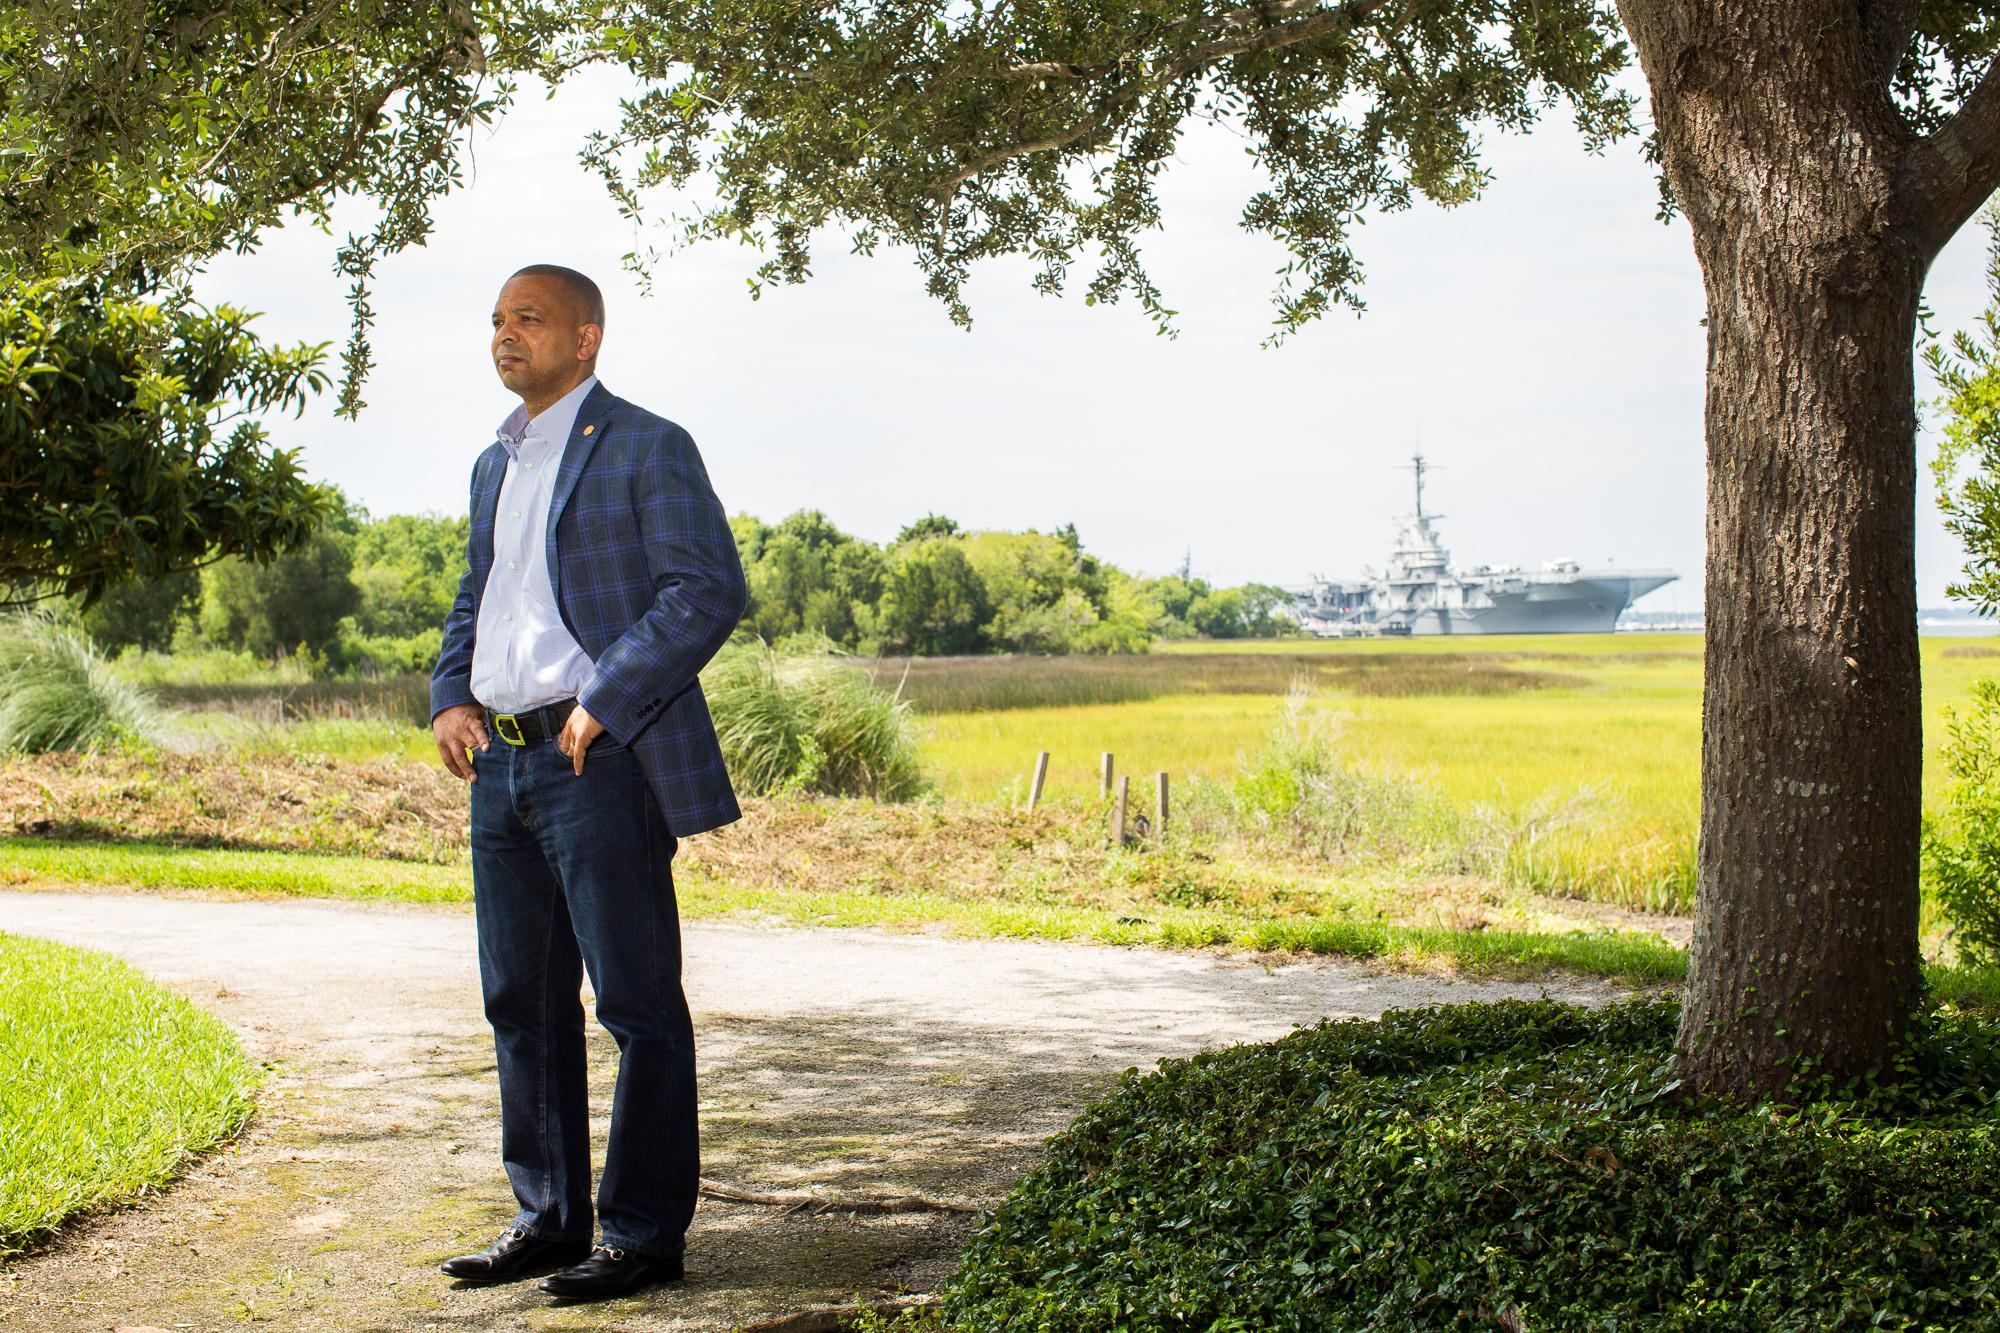 South Carolina Senator Marlon Kimpson (District 42 - Charleston and Dorchester Counties) in Charleston, SC has introduced common-sense gun-control bills in the South Carolina Legistlature.